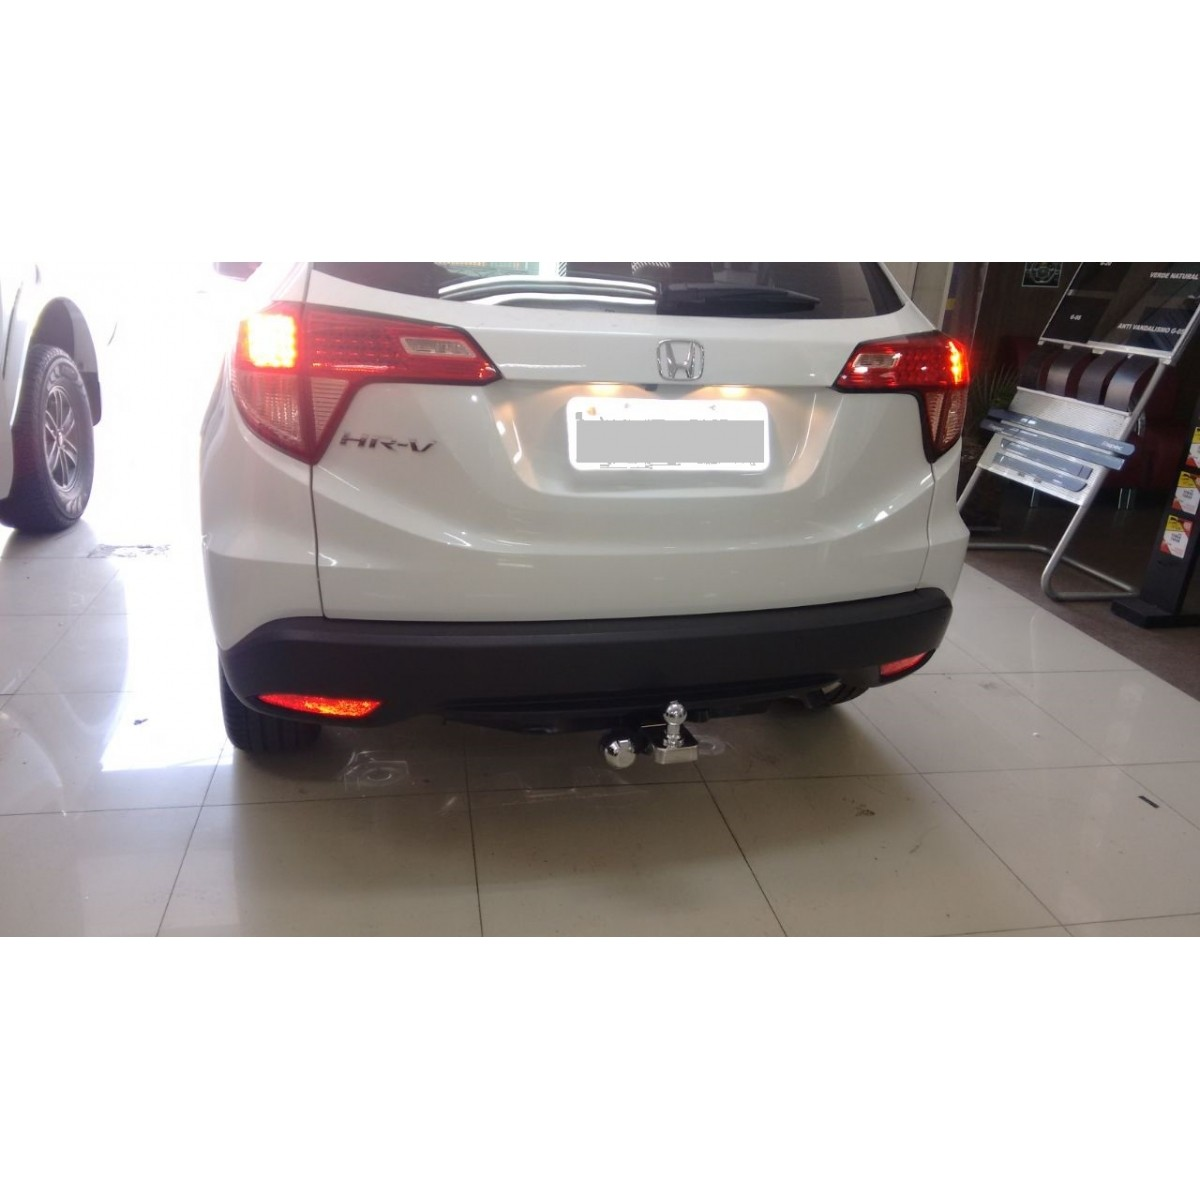 Engate para reboque Honda HRV 2015 Á 2020